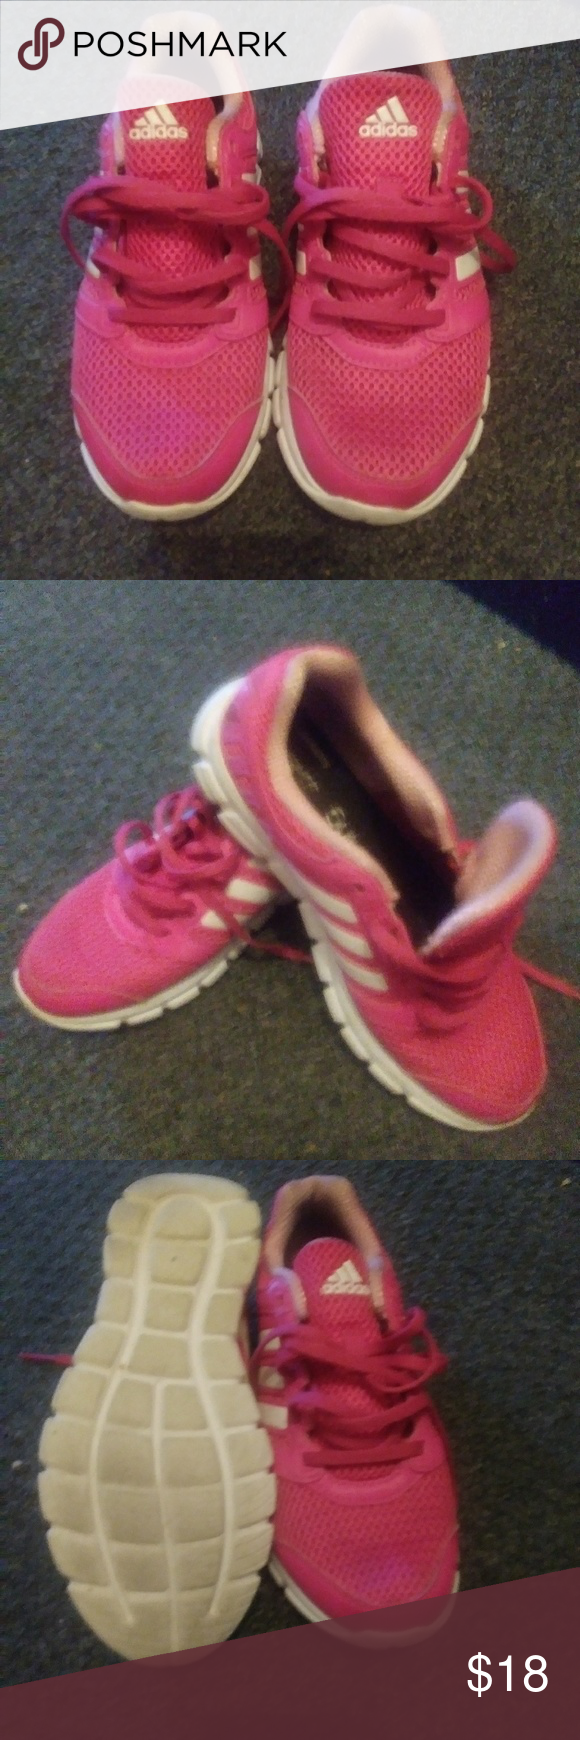 adidas la posh sceglie pinterest rosa bianco e scarpe adidas,